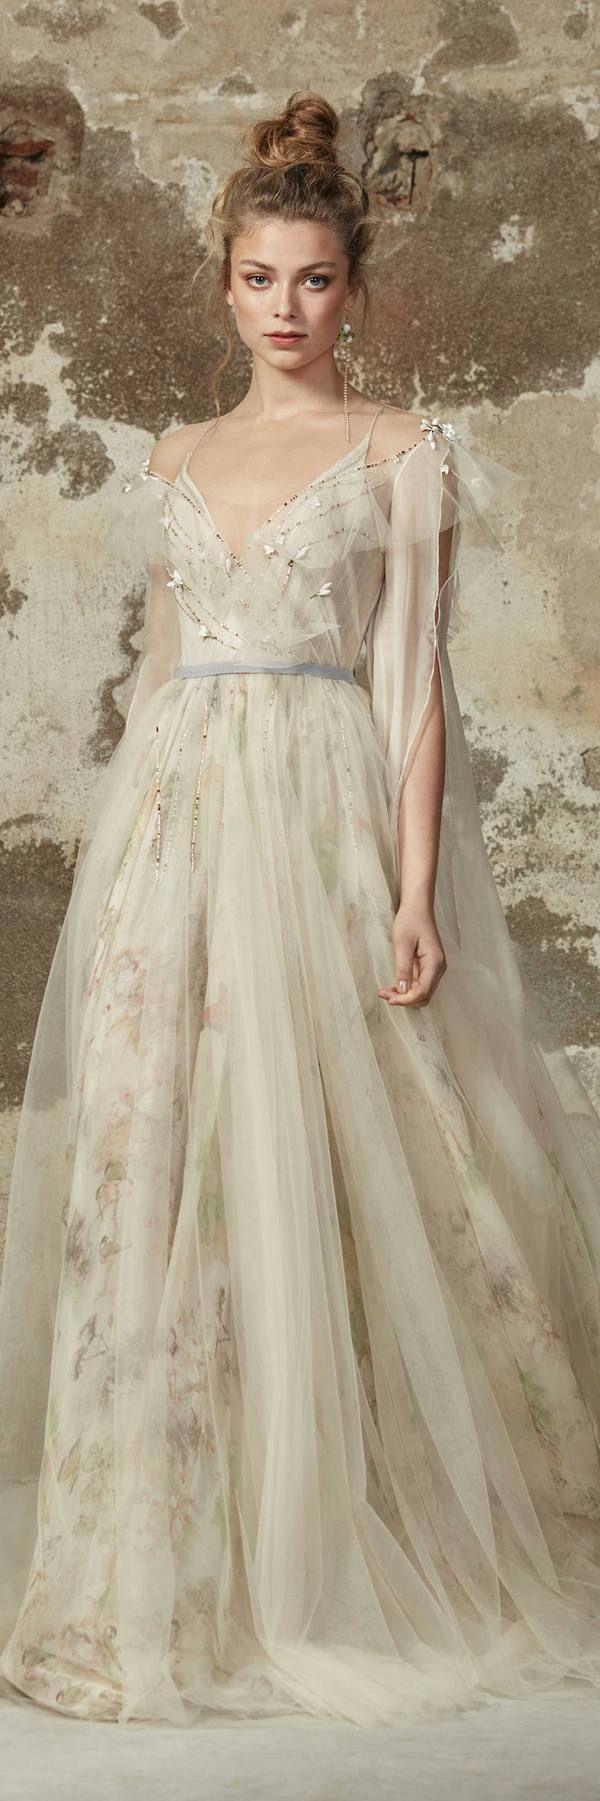 Rara Avis 2018 Wedding Dresses DELVIN / http://www.deerpearlflowers.com/rara-avis-2018-wedding-dresses/